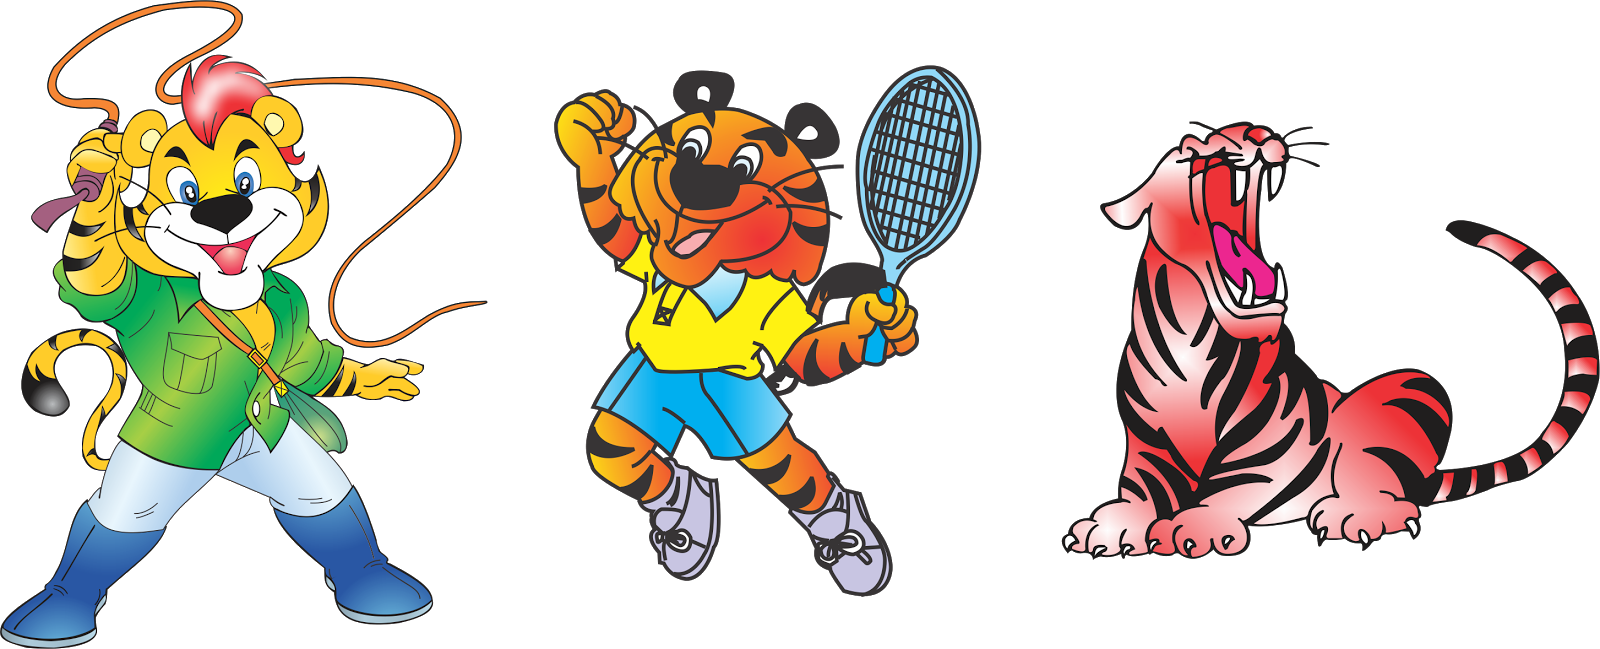 Cartoon Character Design For Tarpaulin : Beautiful d cartoon character designs for comic share khan